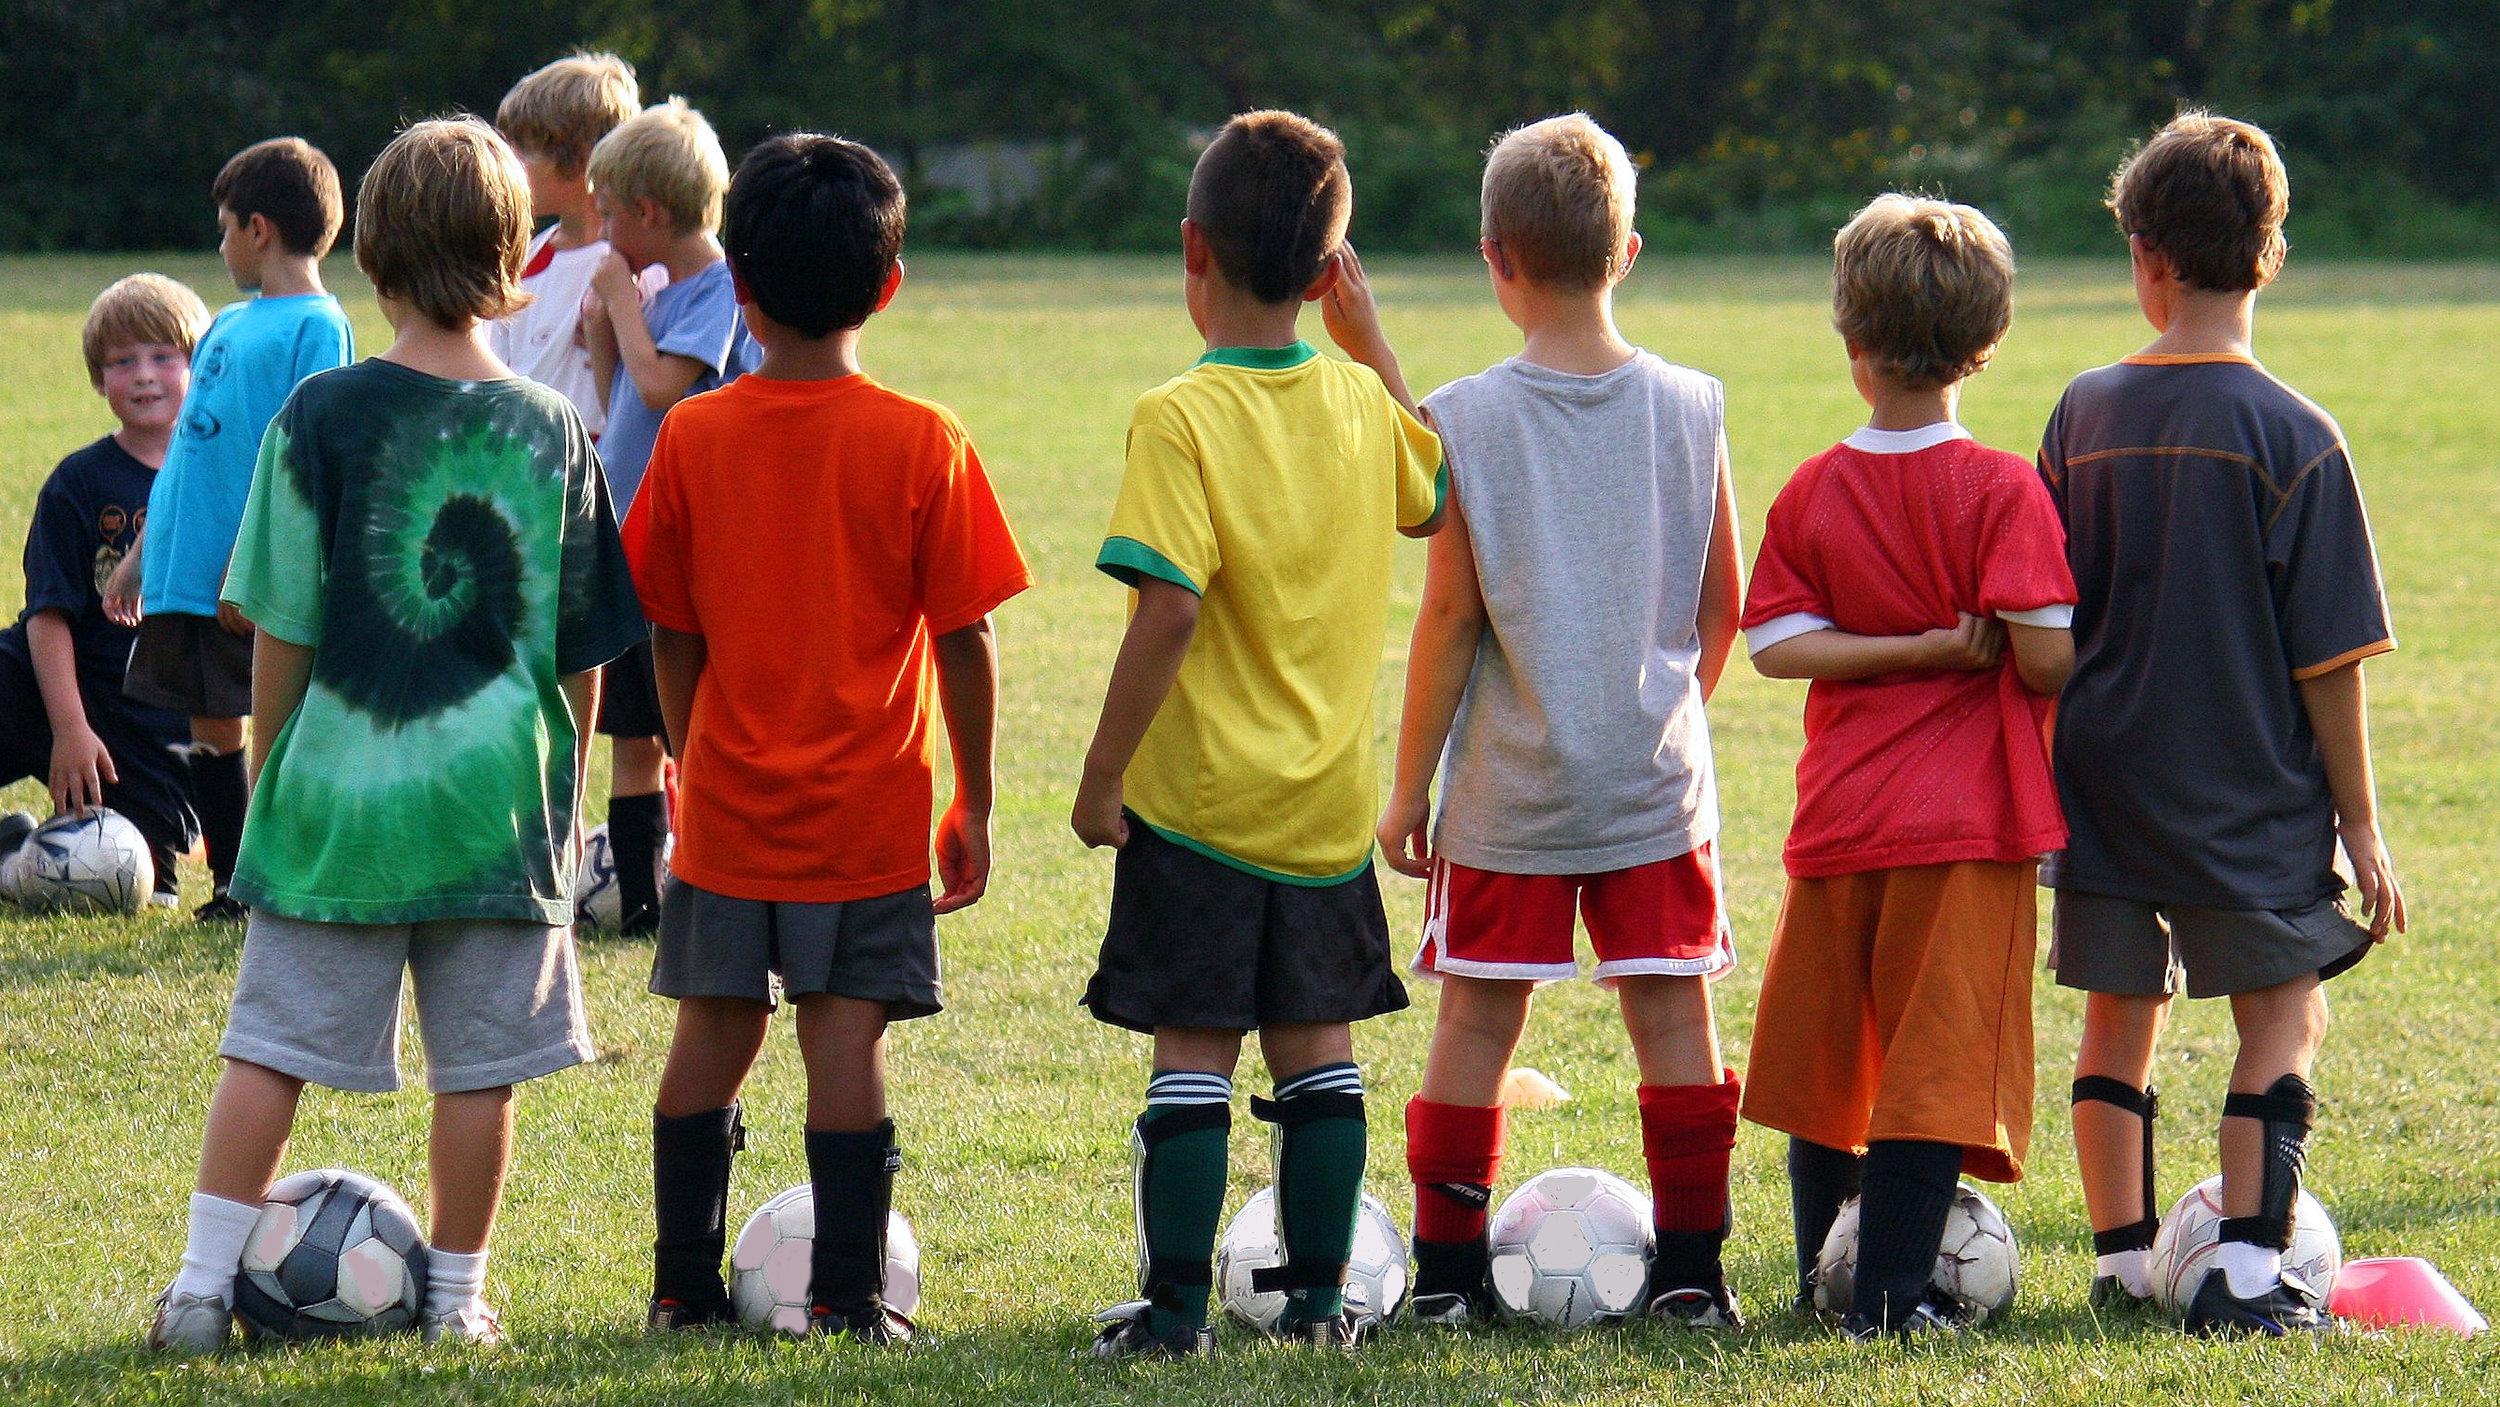 soccerteam-SXC.hu-user-bwilhelms.jpg